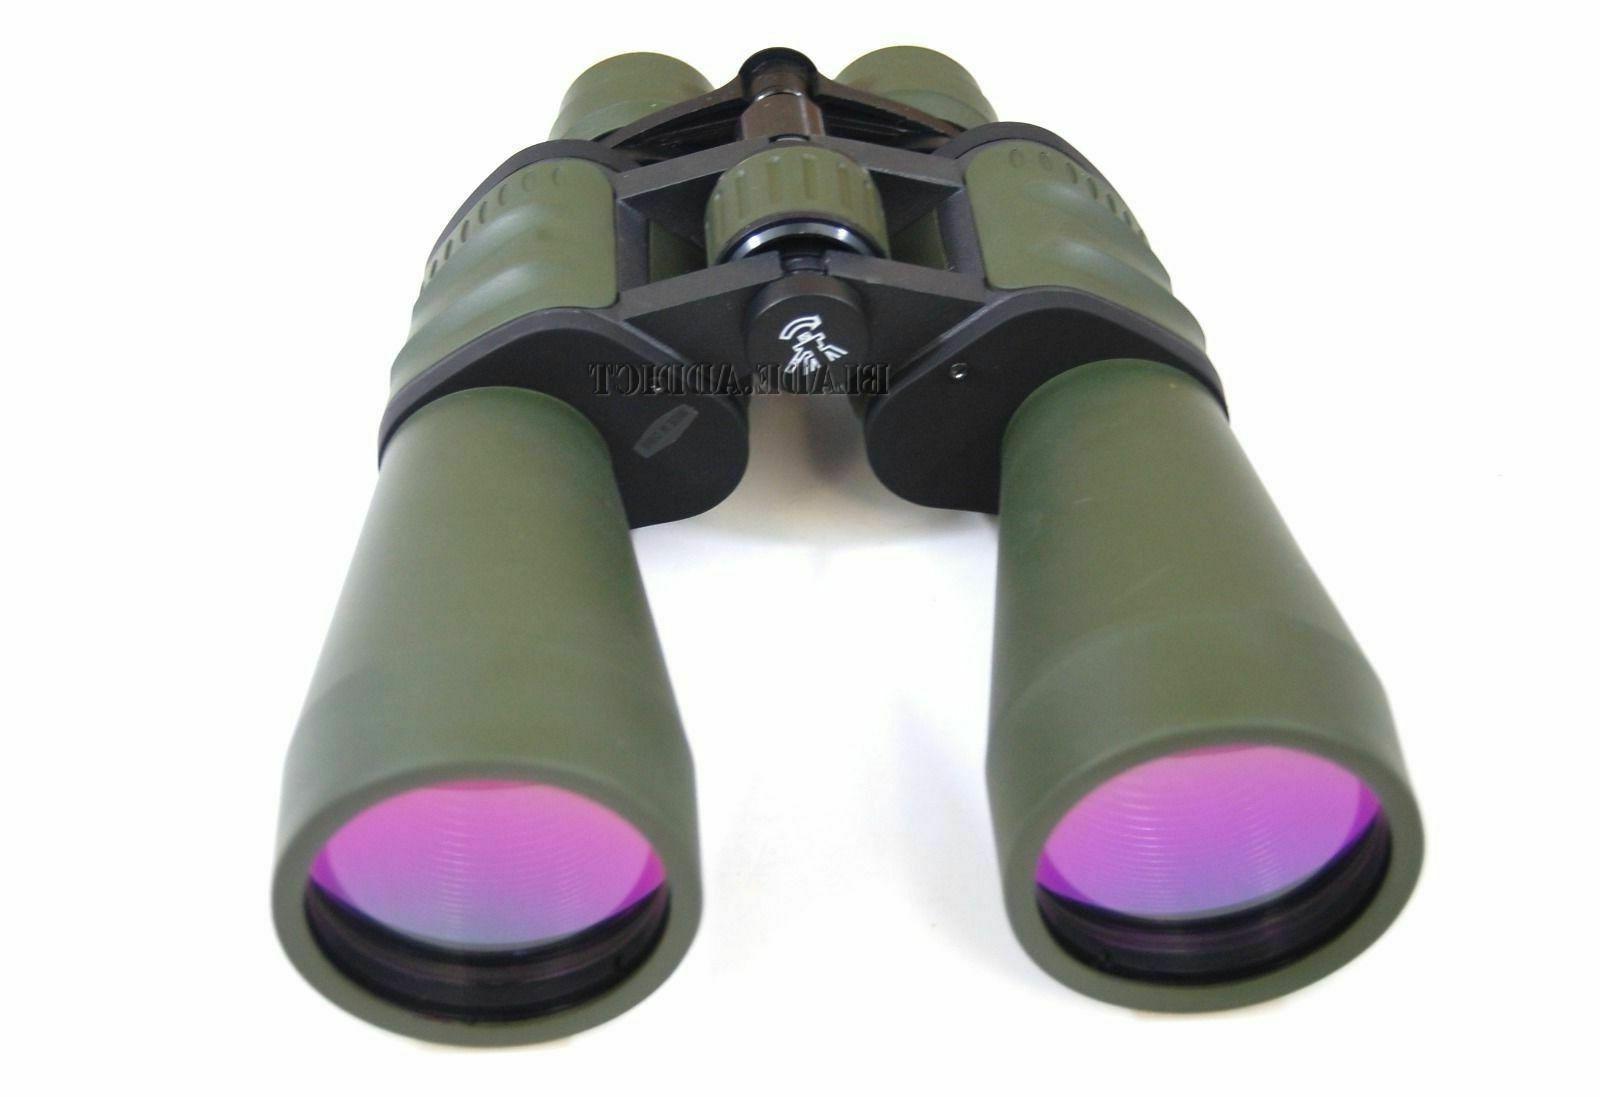 10x-120x90 Military Zoom Hunting